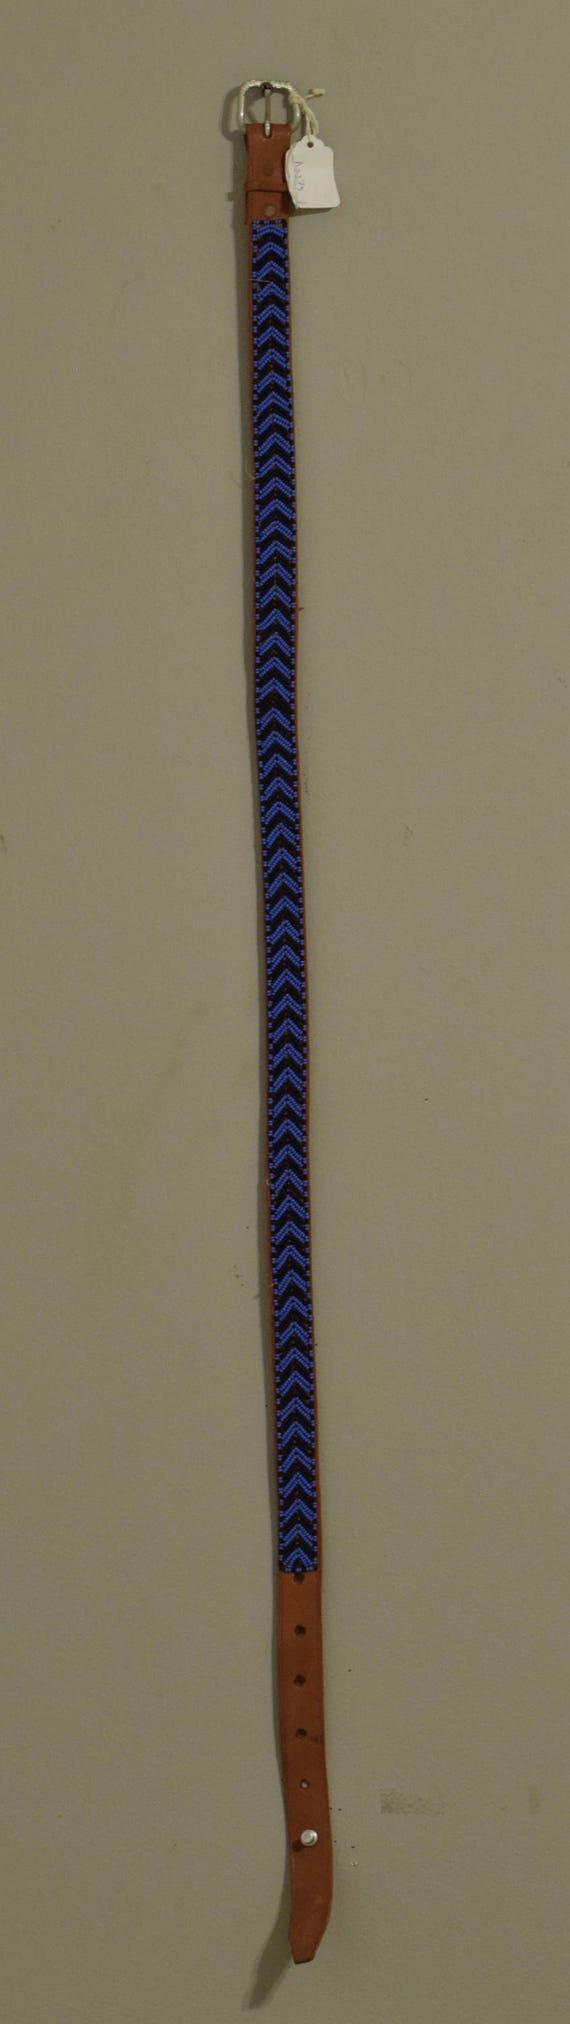 African Beaded Masai Leather Belt Handmade Men Women Royal Blue Navy Beads Slacks Pants Skirts Masai Leather Belts